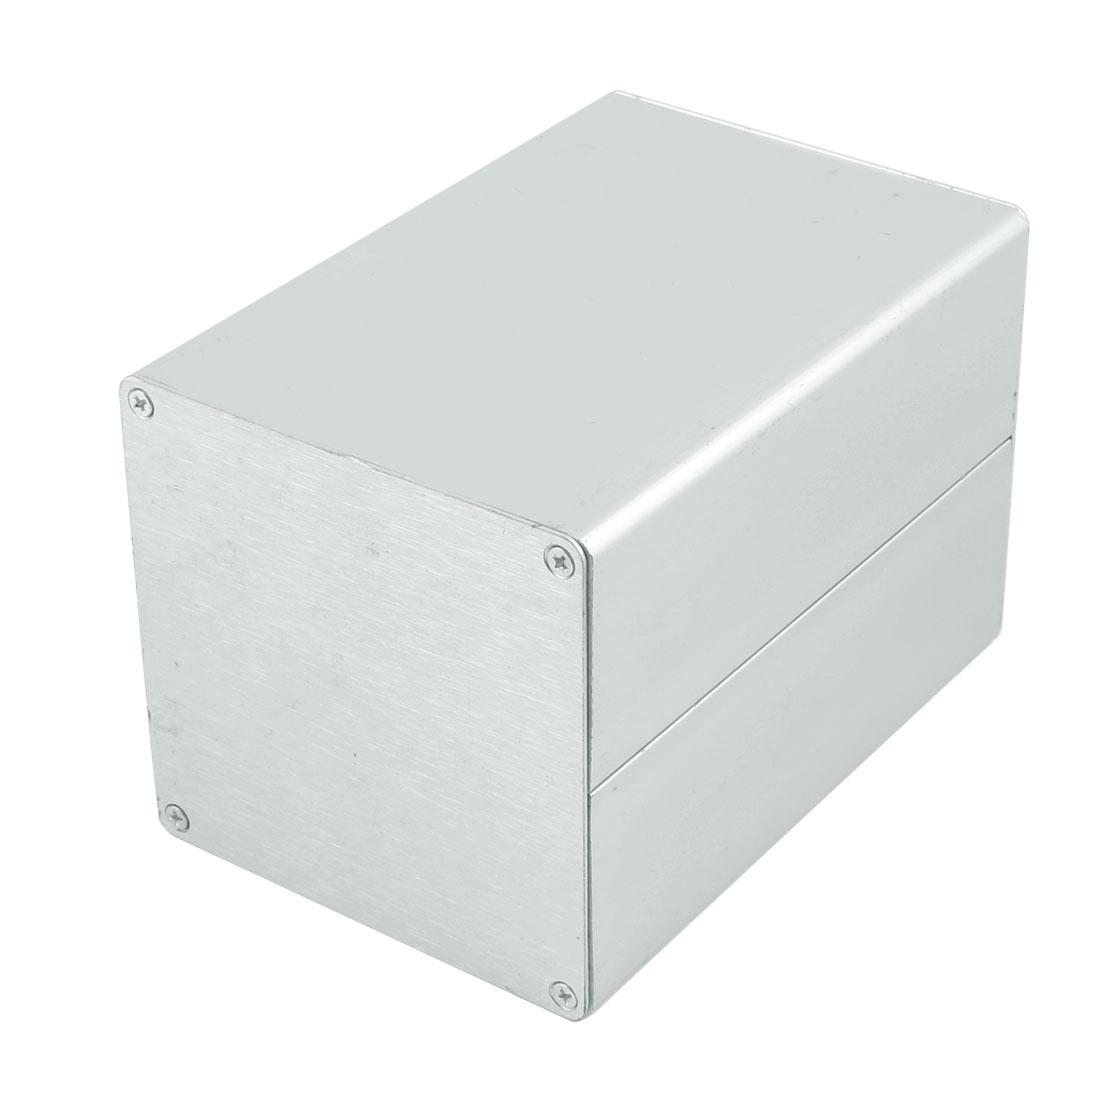 90 X 90 X 130mm Multi-purpose Electronic Extruded Aluminum Enclosure Case Silver Tone